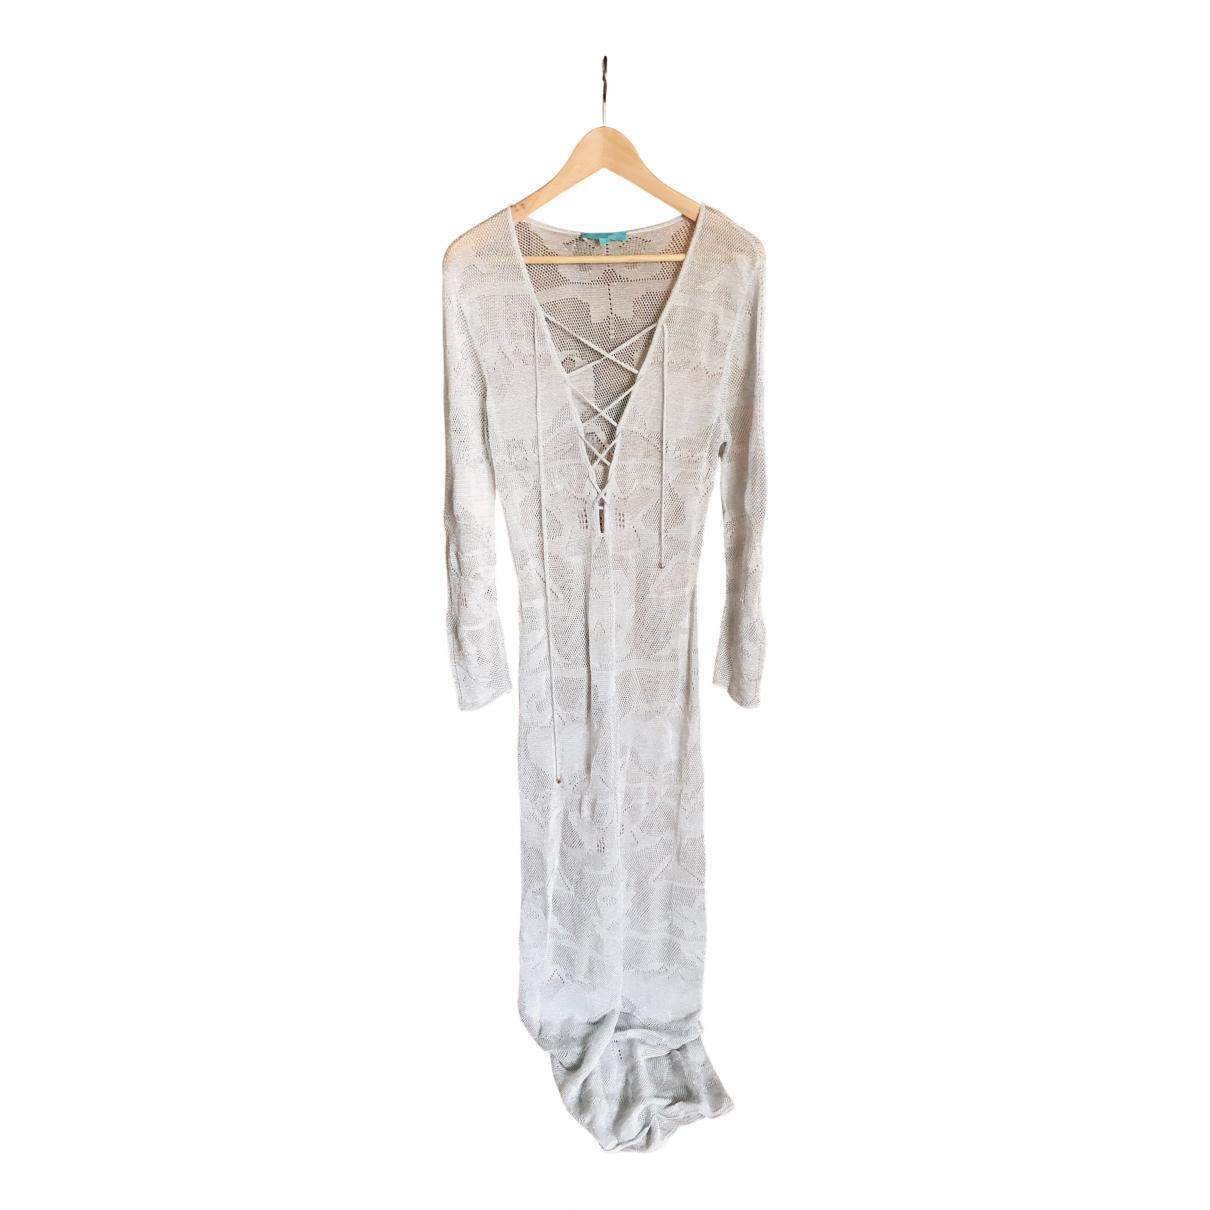 Melissa Odabash \N Kleid in  Silber Synthetik